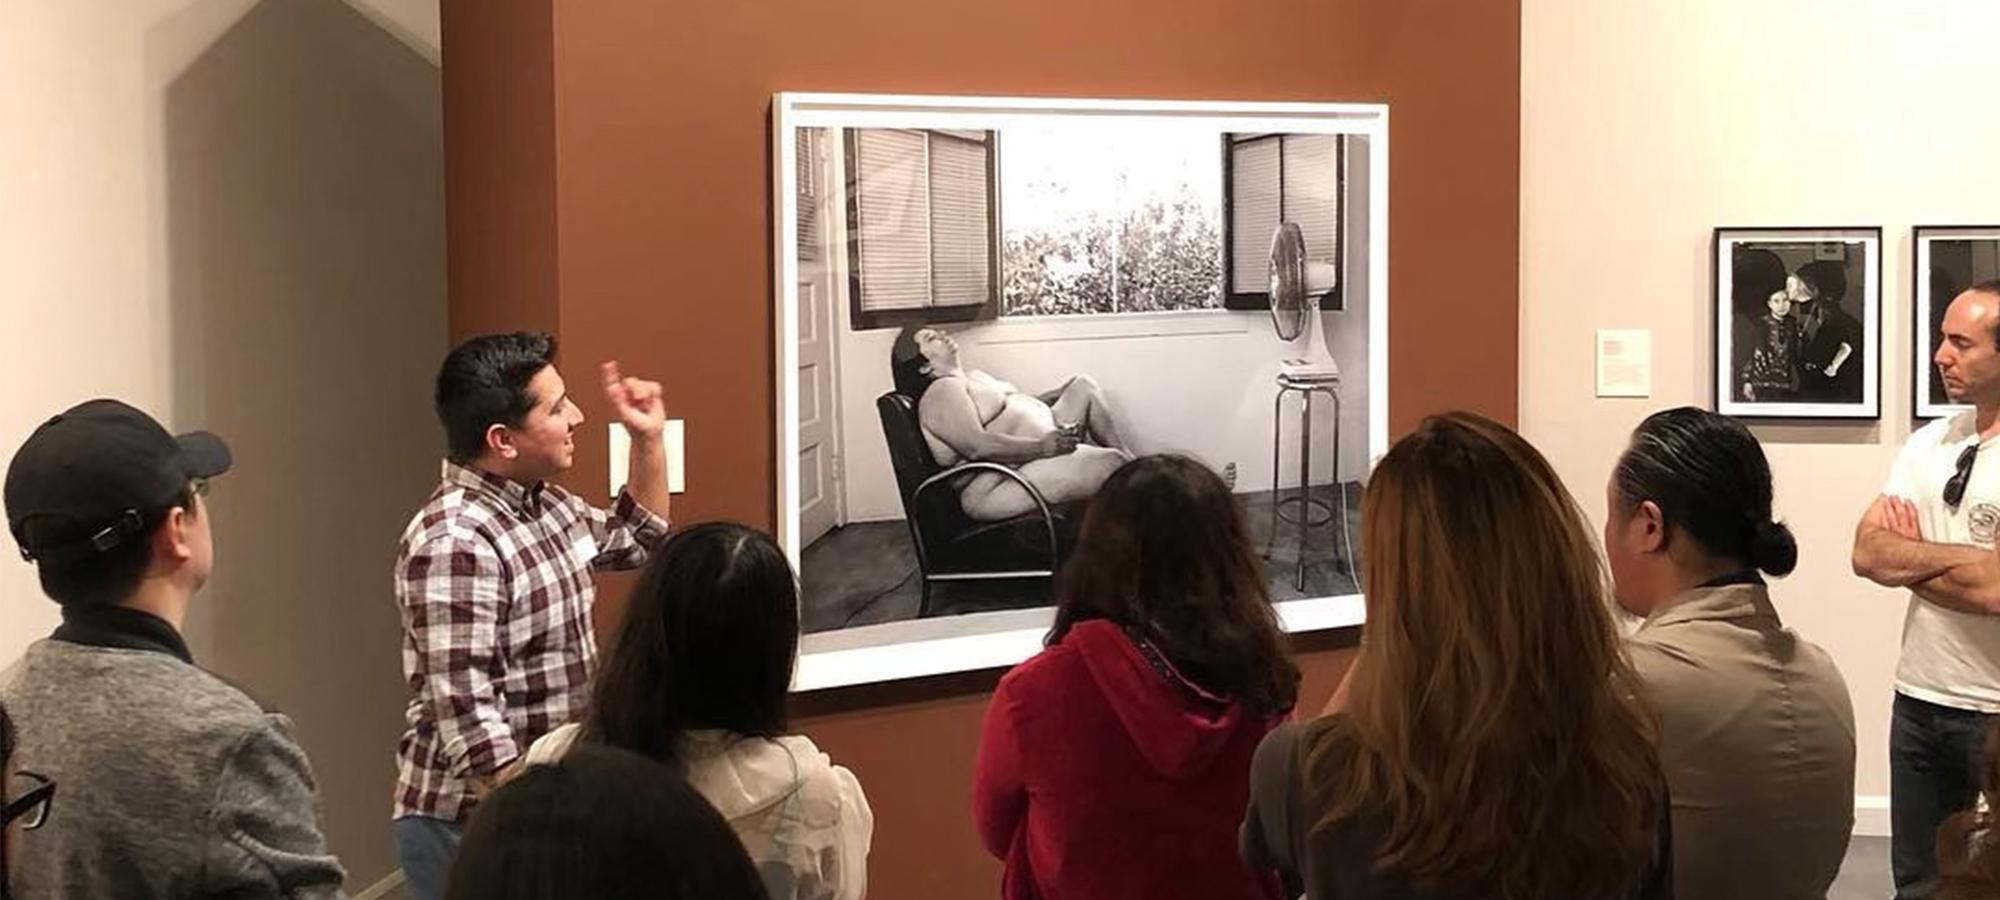 Vincent Price Art Museum Opportunities Getty Internship